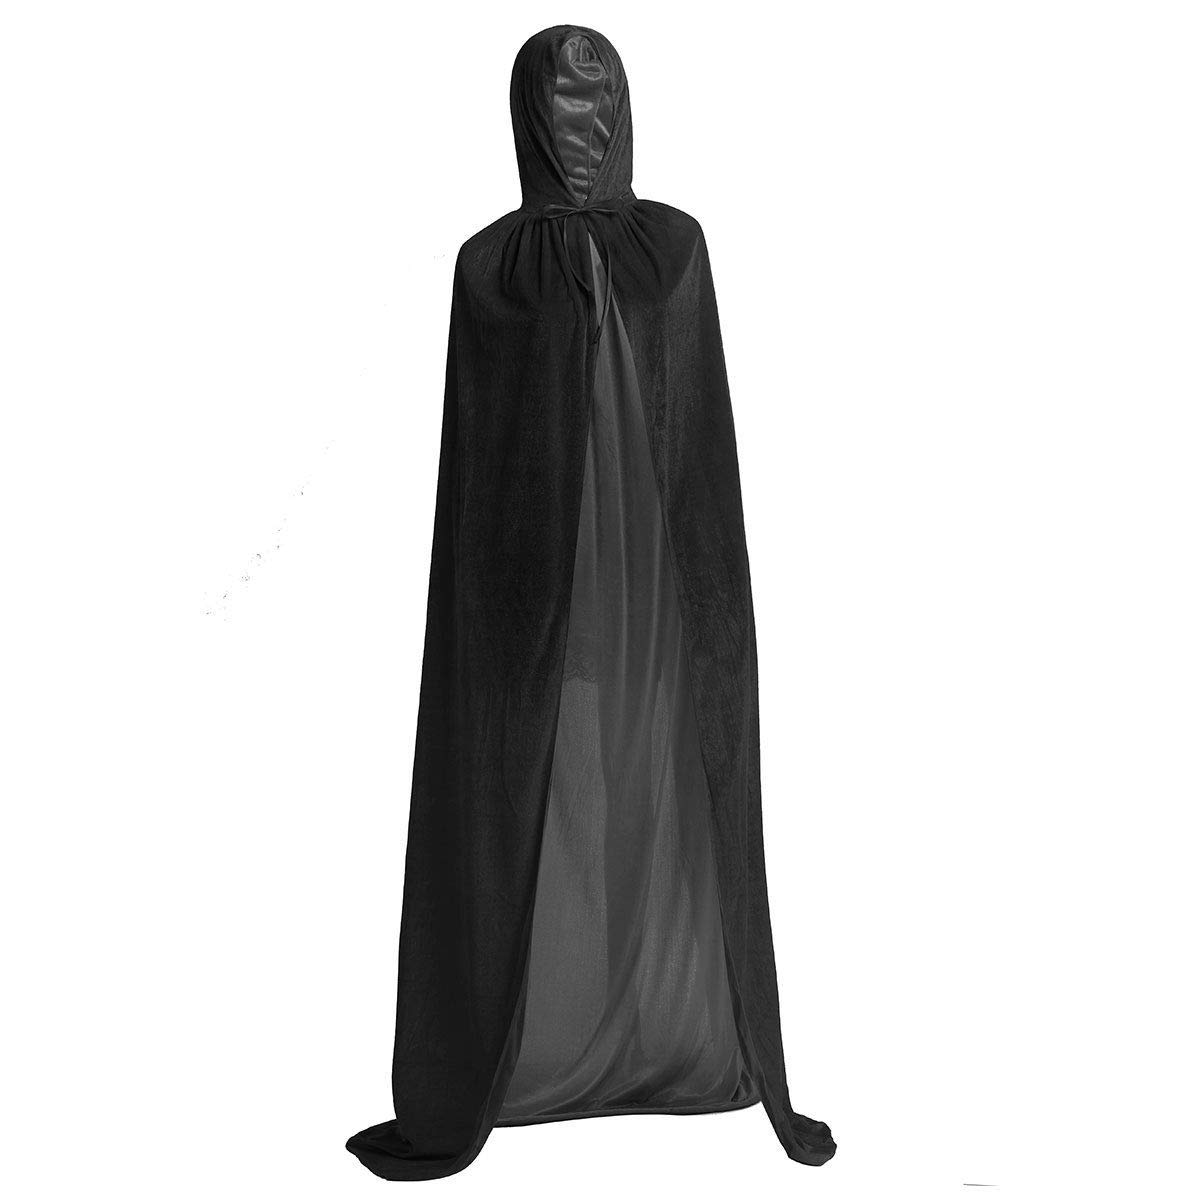 BJ-Shop Capas de Halloween,Fiesta de Halloween Disfraz Long Black Cloak Unisex Robe Cape para Ni/ños Adultos